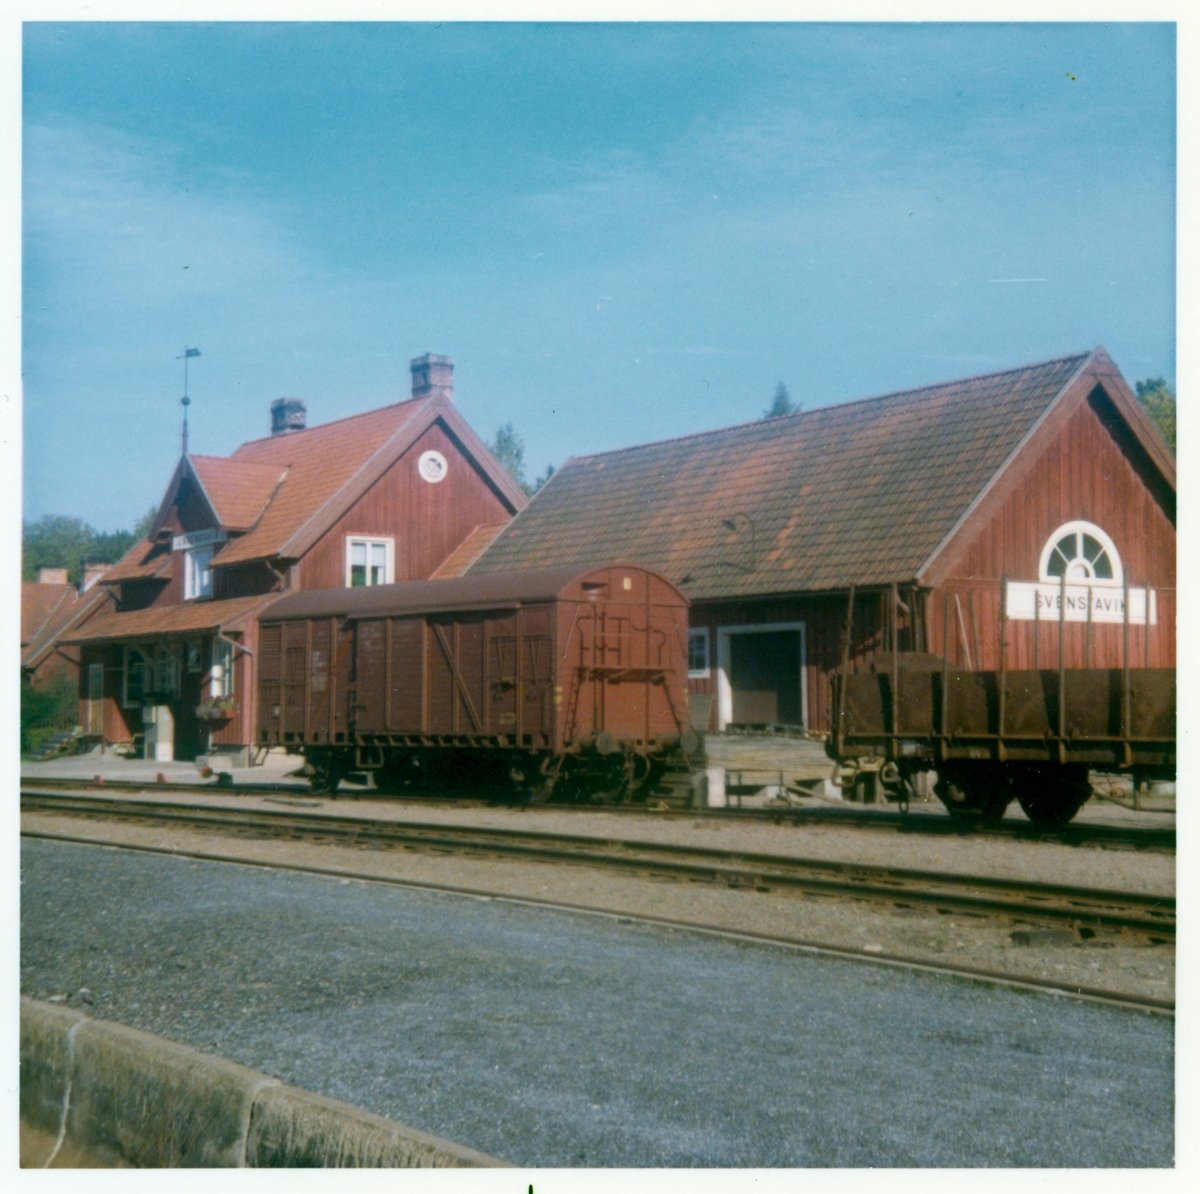 Svenstavik stationshus.